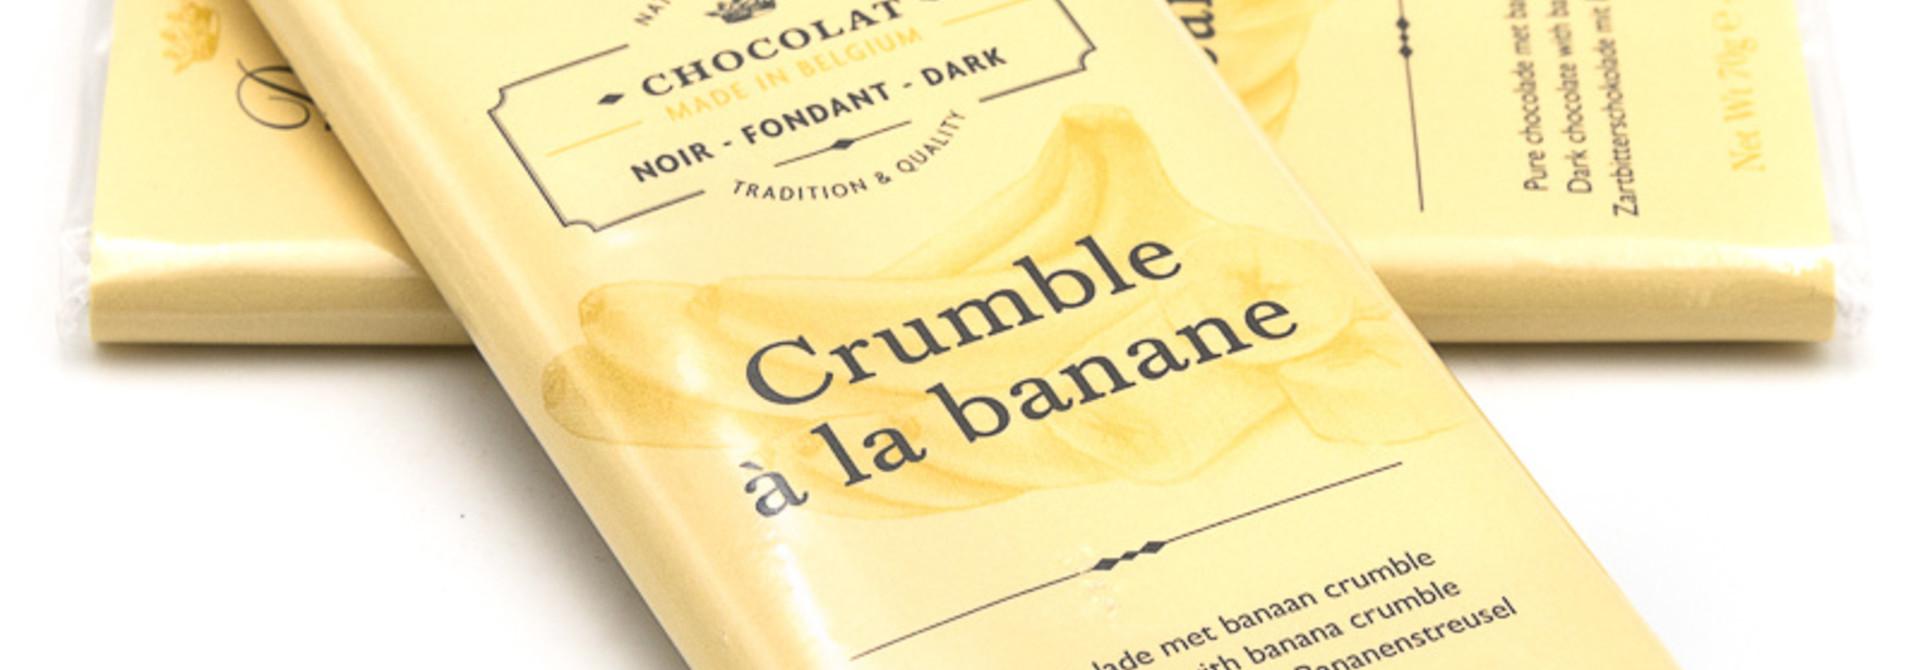 Dolfin dark chocolate 70% (banana crumble)